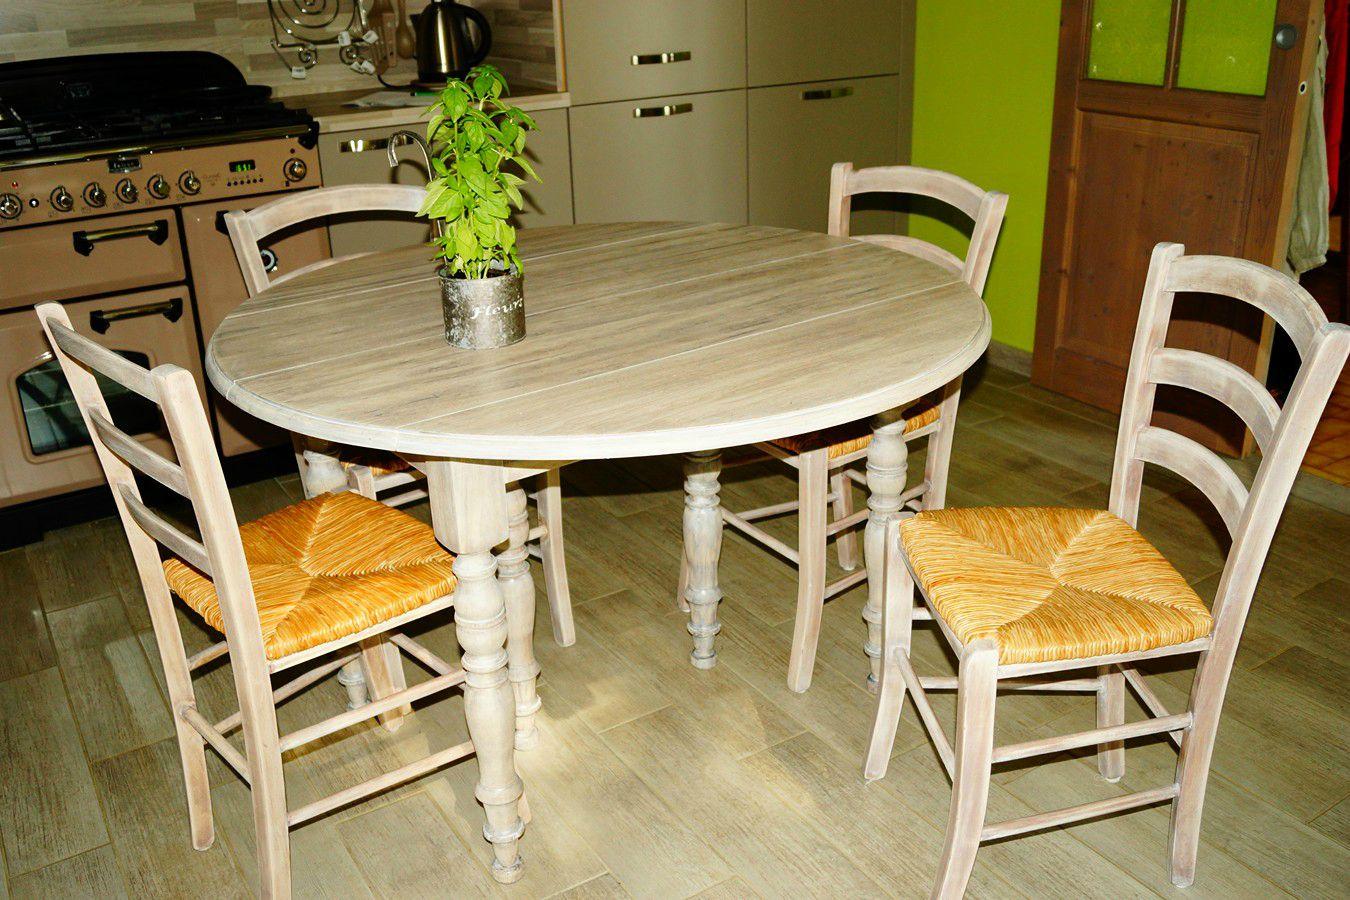 Mesa y sillas de cocina dise os arquitect nicos - Sillas de cocina de segunda mano ...